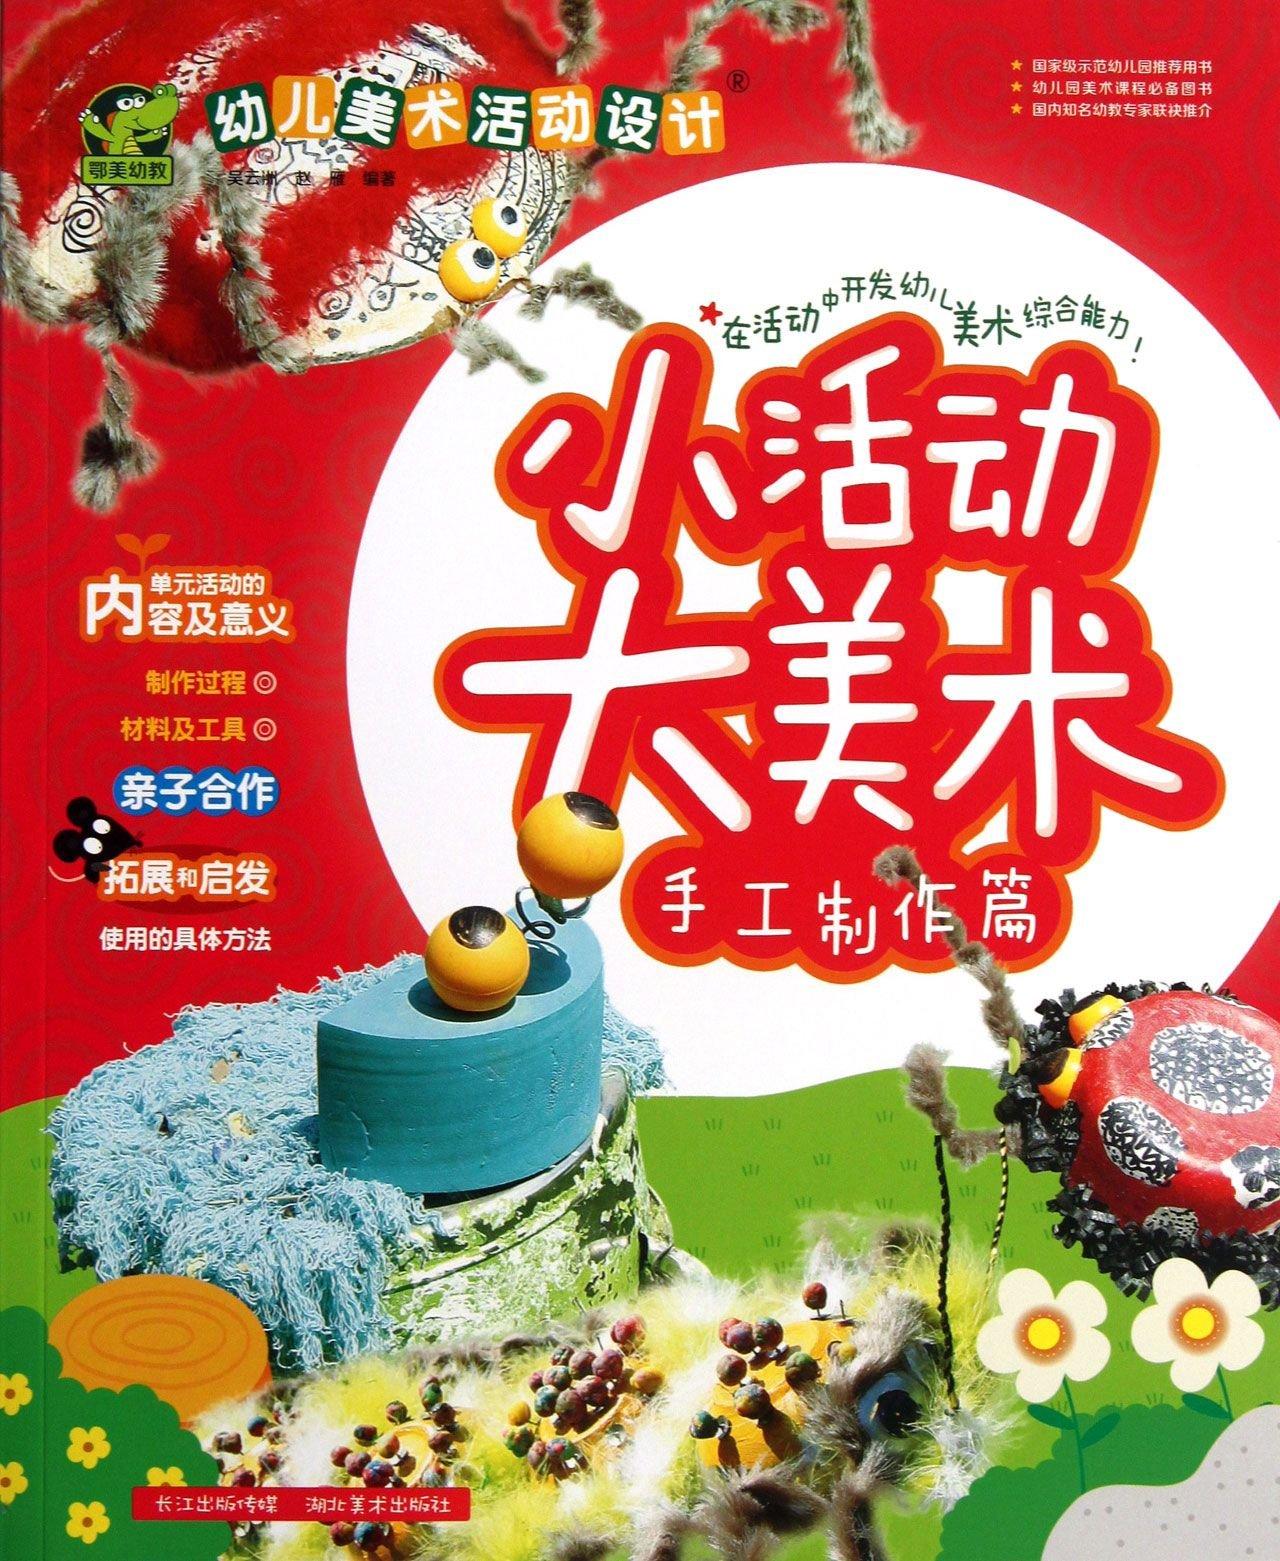 Preschool art activities Design: Little Big Arts & Events handmade papers(Chinese Edition) pdf